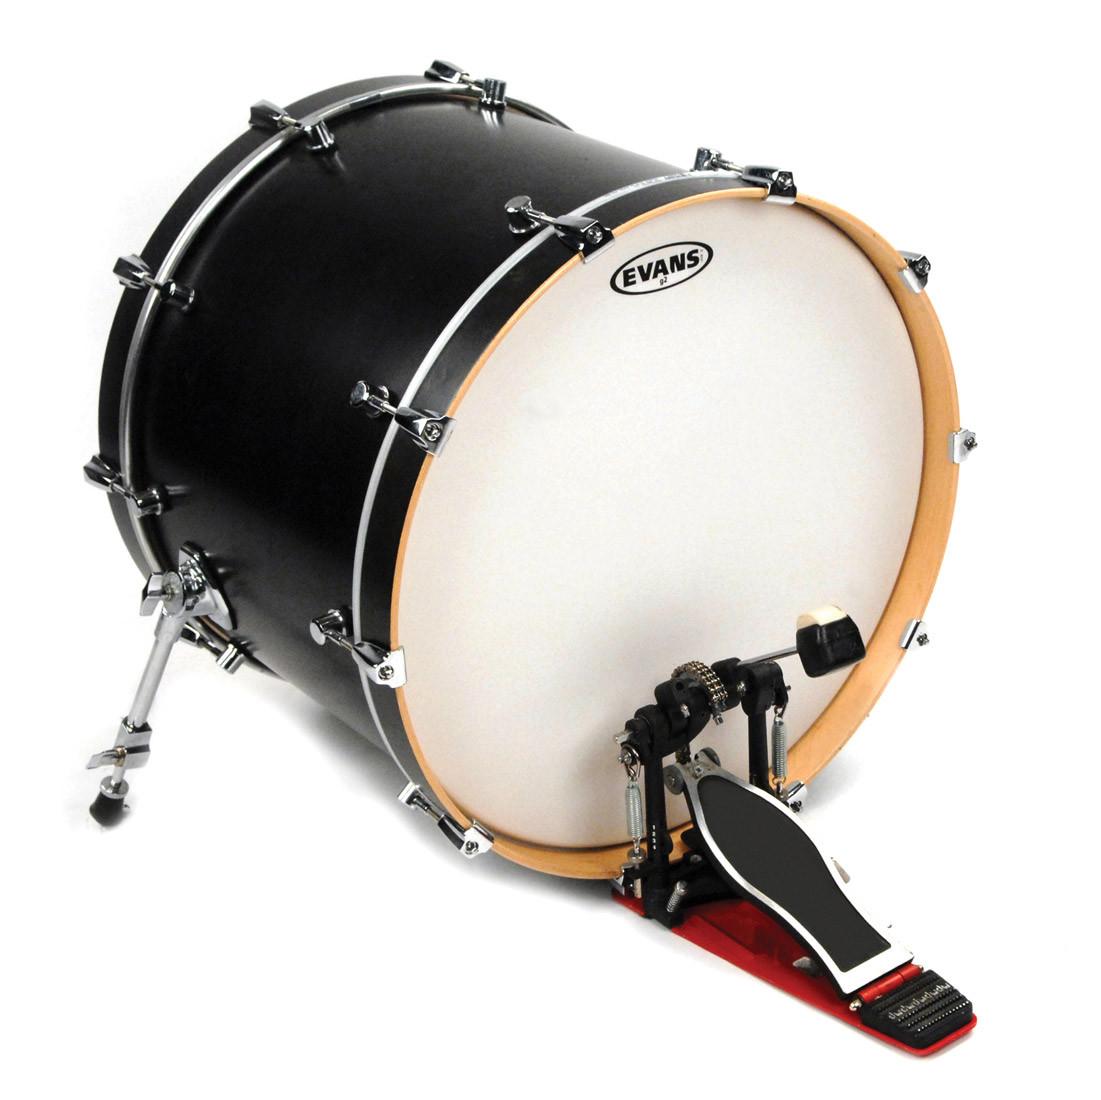 evans 20 g2 coated white bass drum head drums on sale. Black Bedroom Furniture Sets. Home Design Ideas